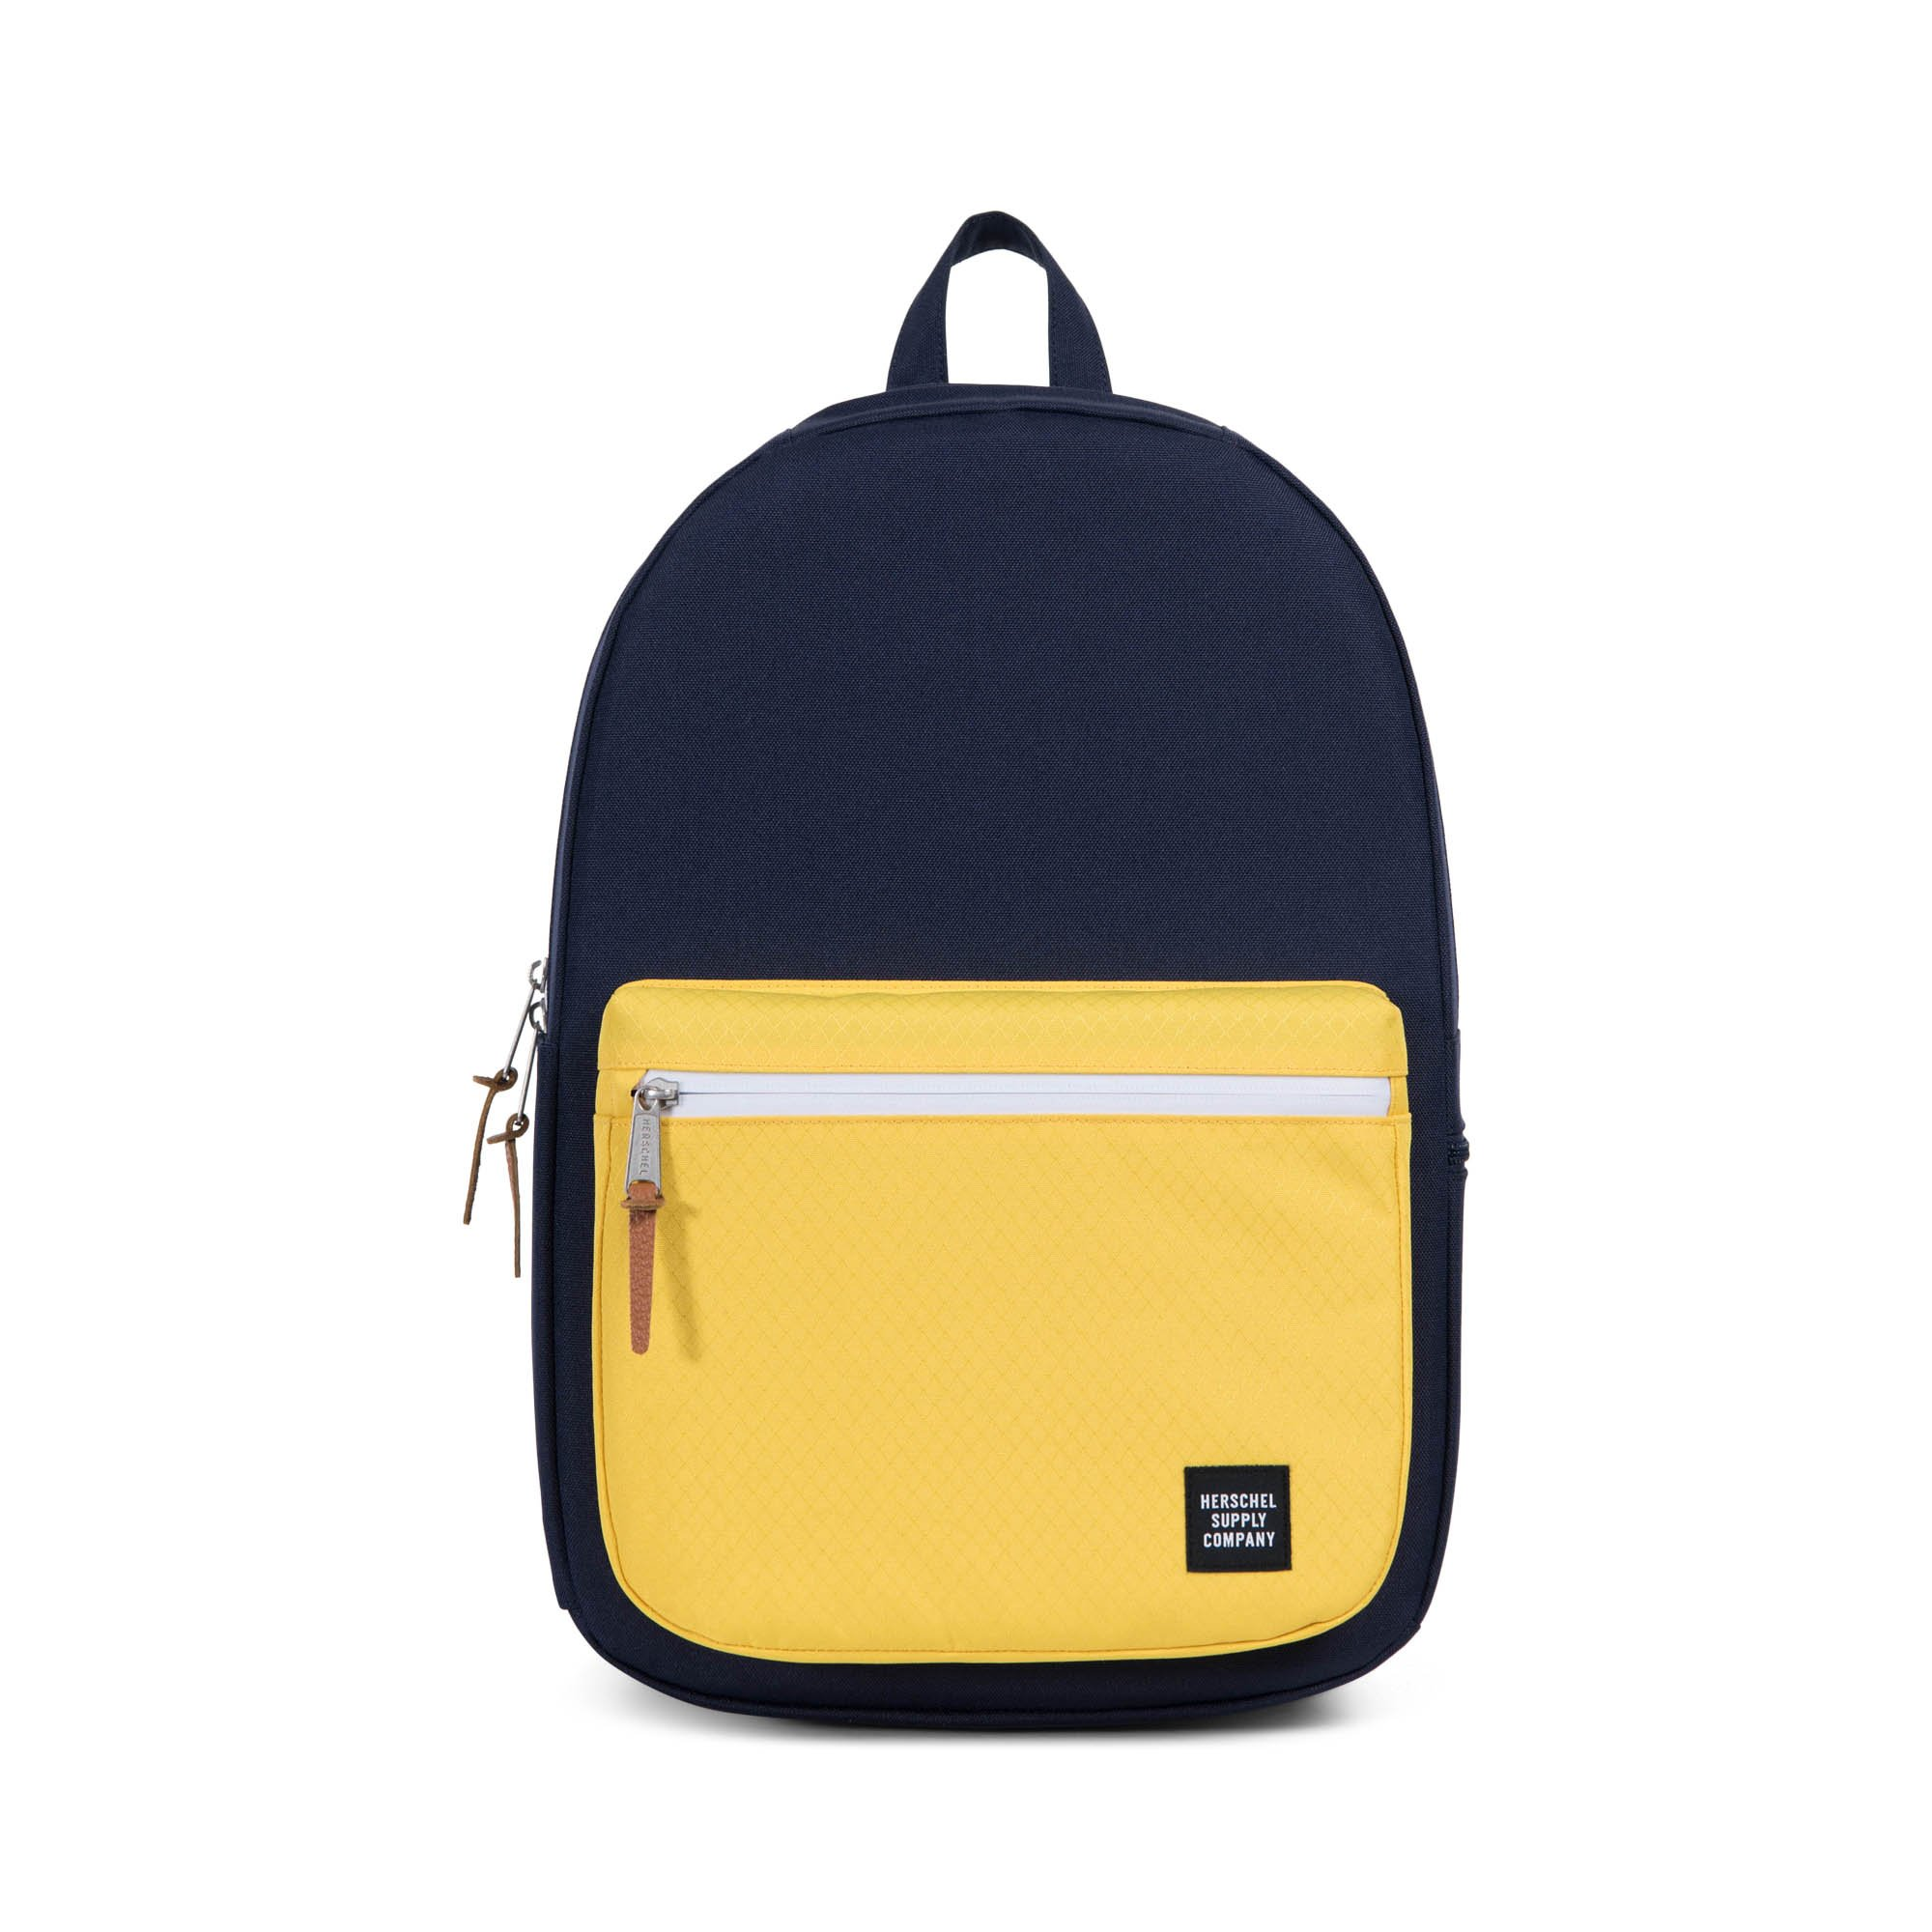 Herschel Supply Co. Harrison Backpack, Peacoat/Cyber Yellow